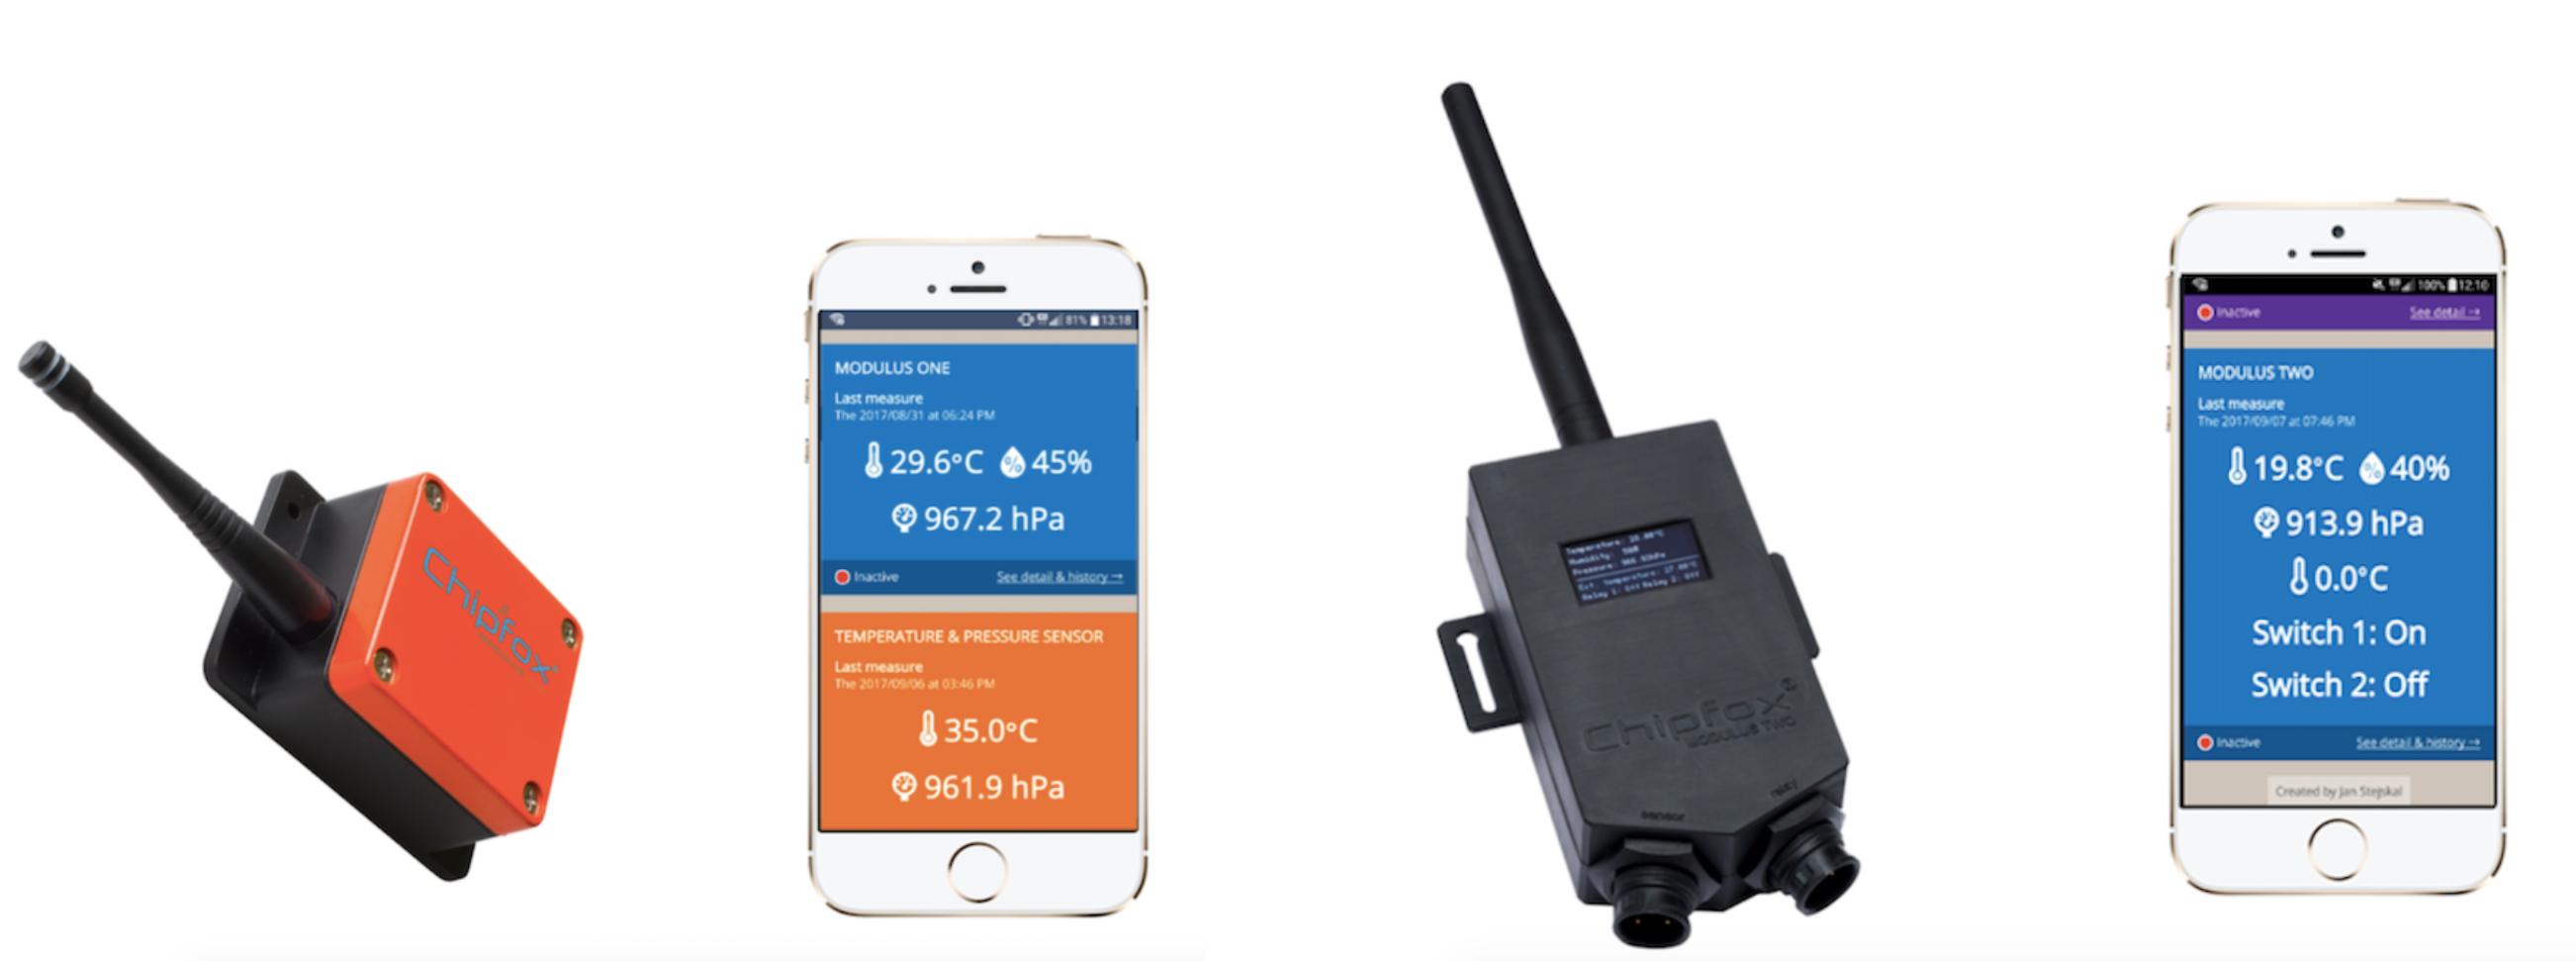 Modulusone Multipurpose Sigfox Device 2 Way Satellite Switch Suitable For